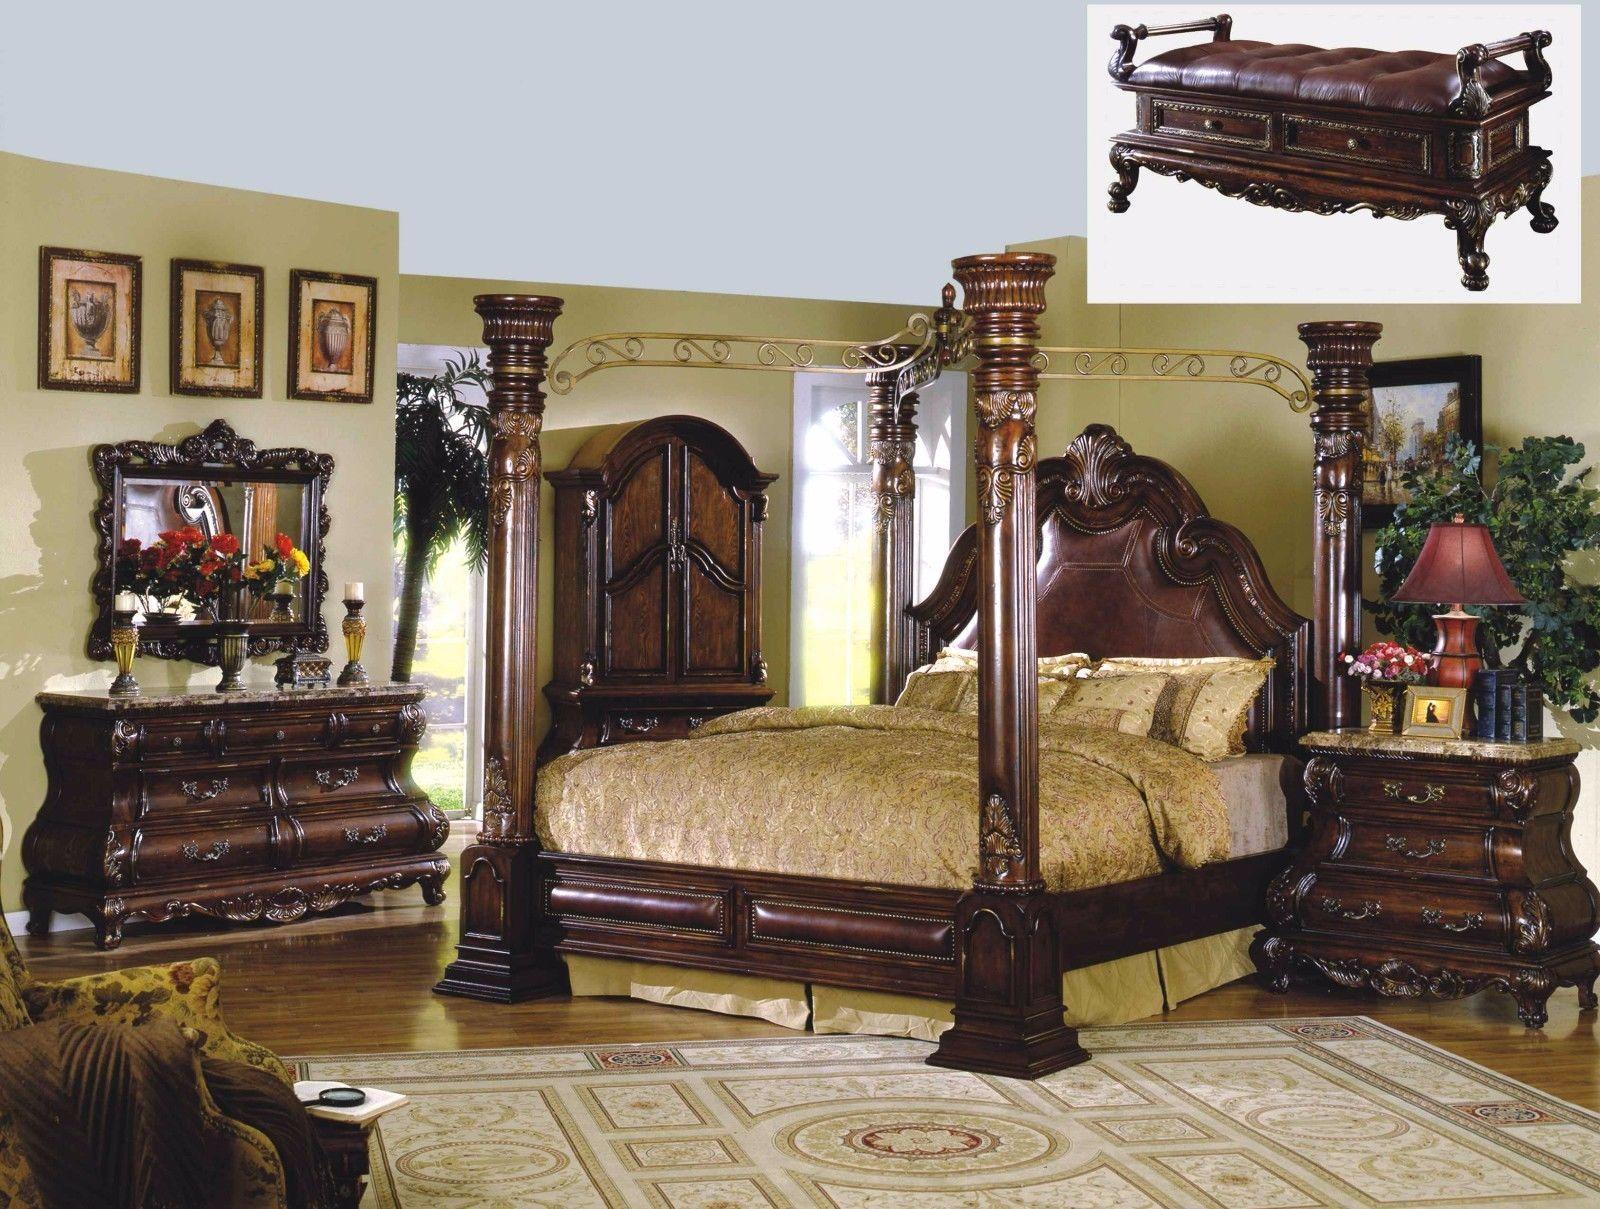 Mcferran RB9088 Monaco Leather California King Size Bedroom set 5.pc Traditional